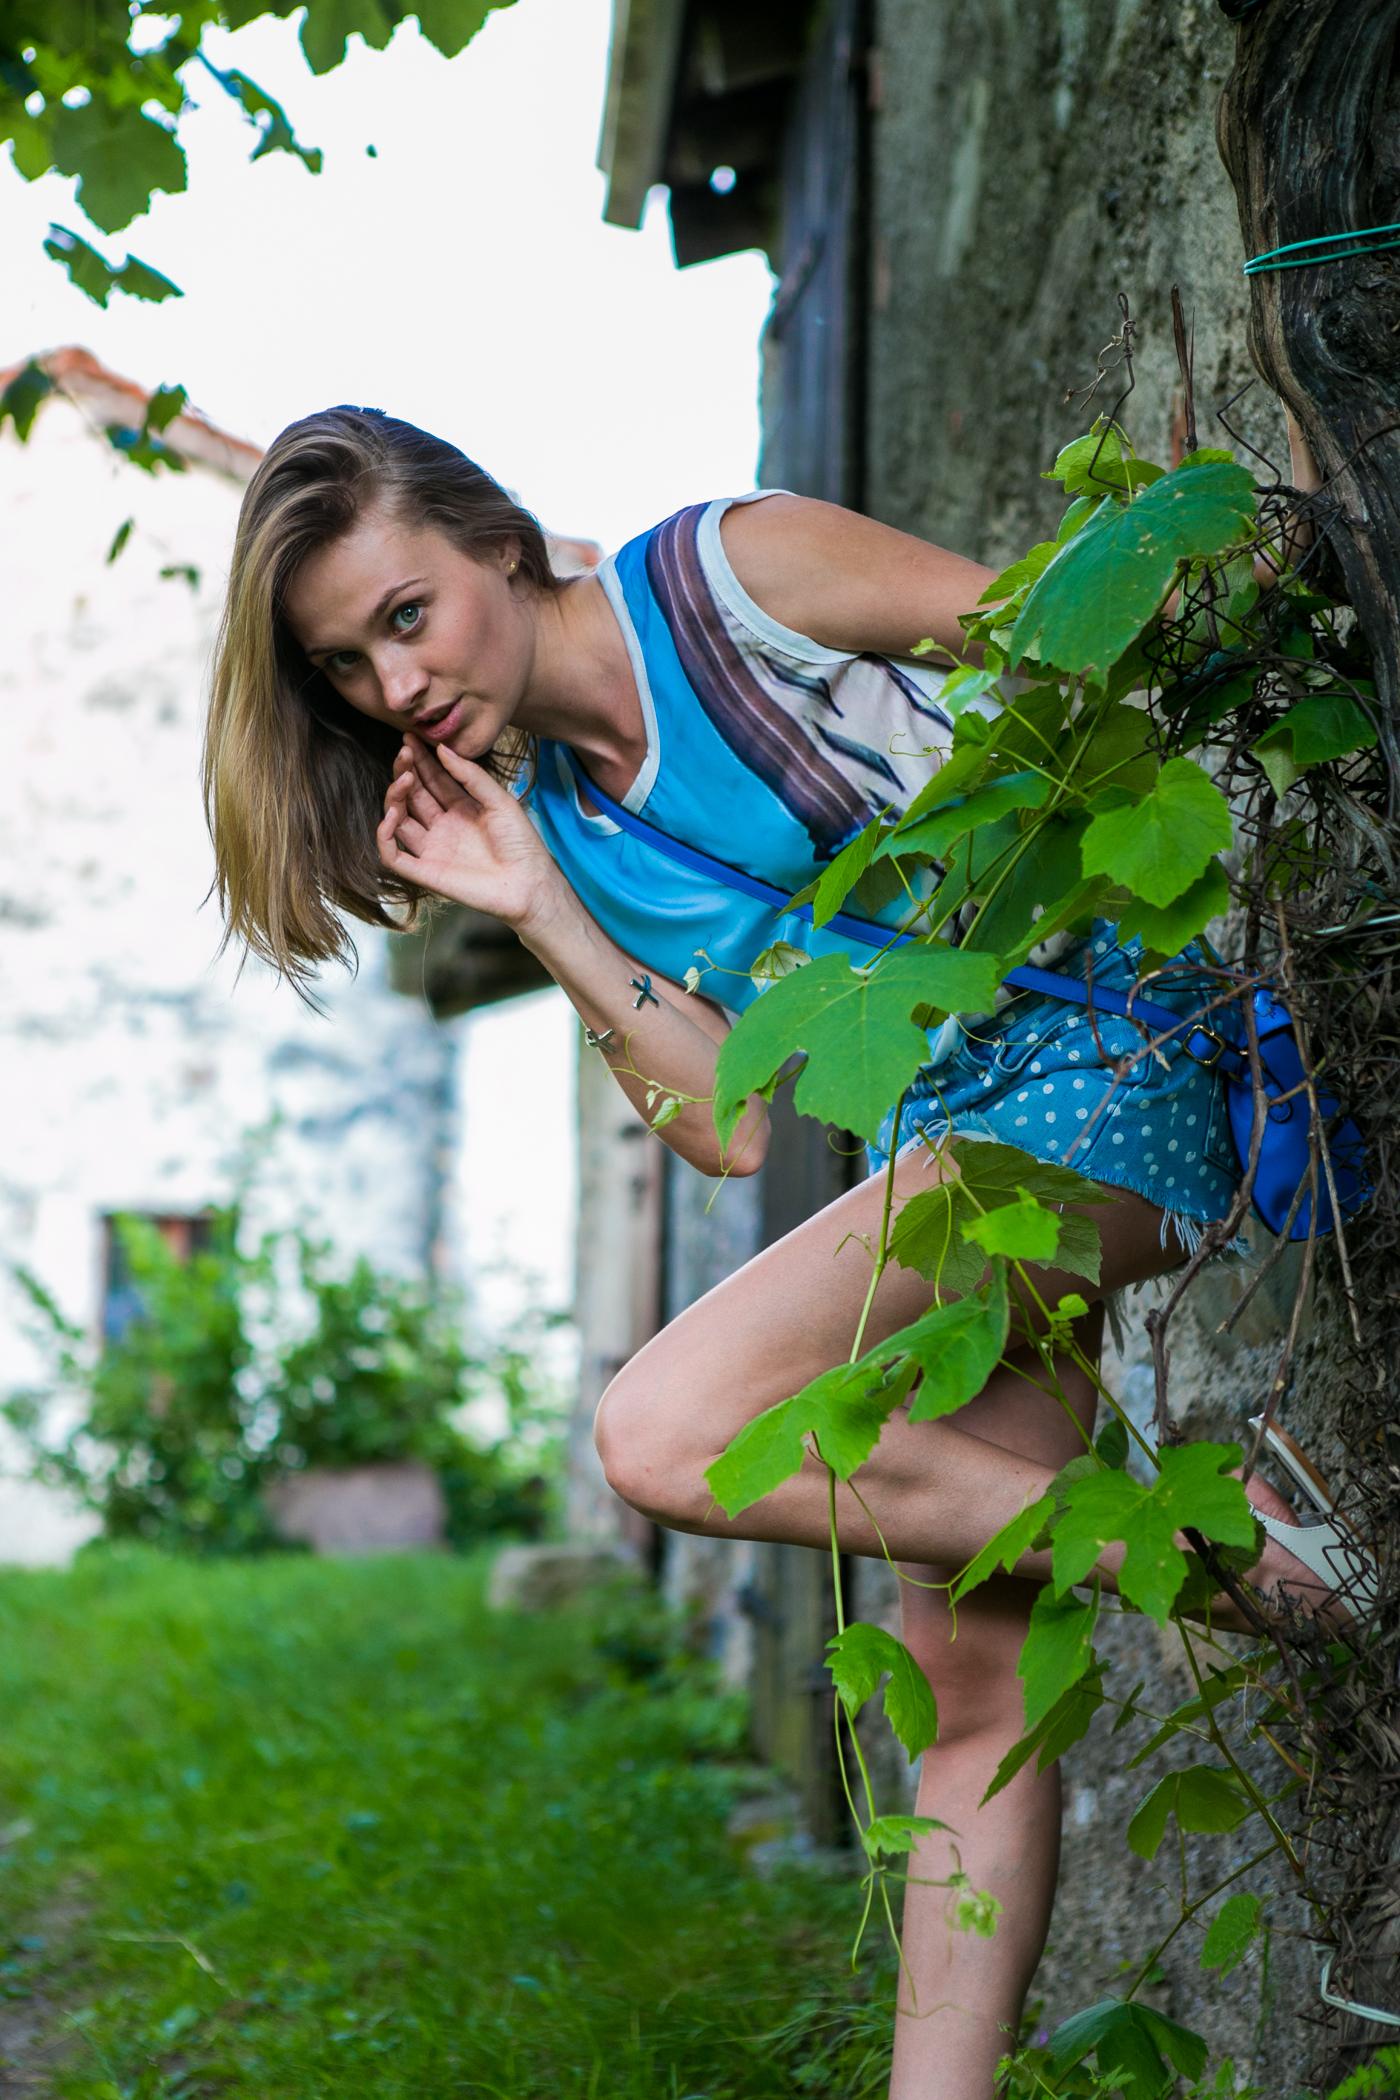 thecablook darya kamalova fashion blog street style denim shorts ash booties hm hat iseo lake piramidi di zona brescia-167